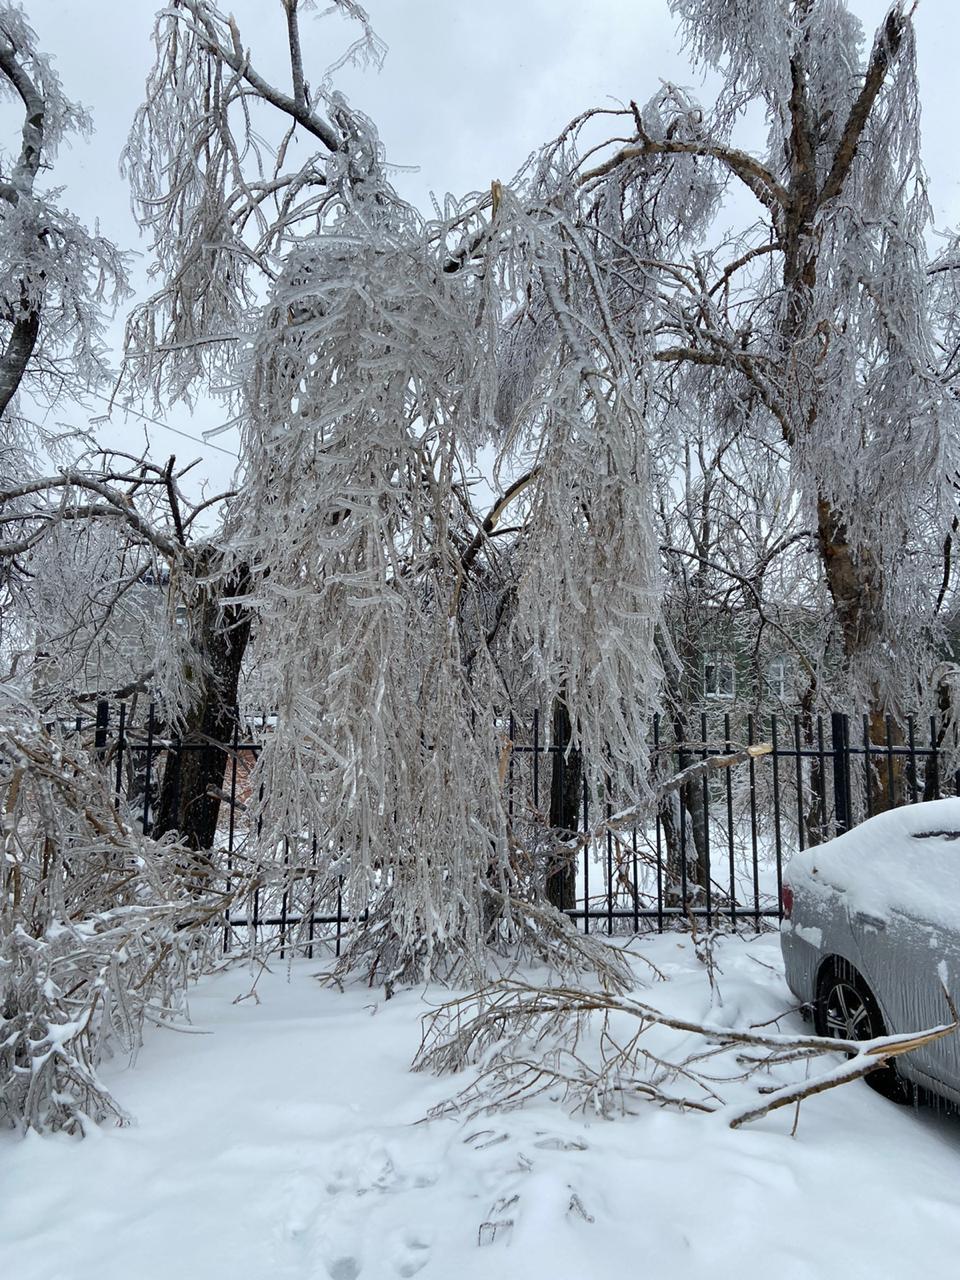 Владивосток в ледяном плену. Фото и видео очевидца.